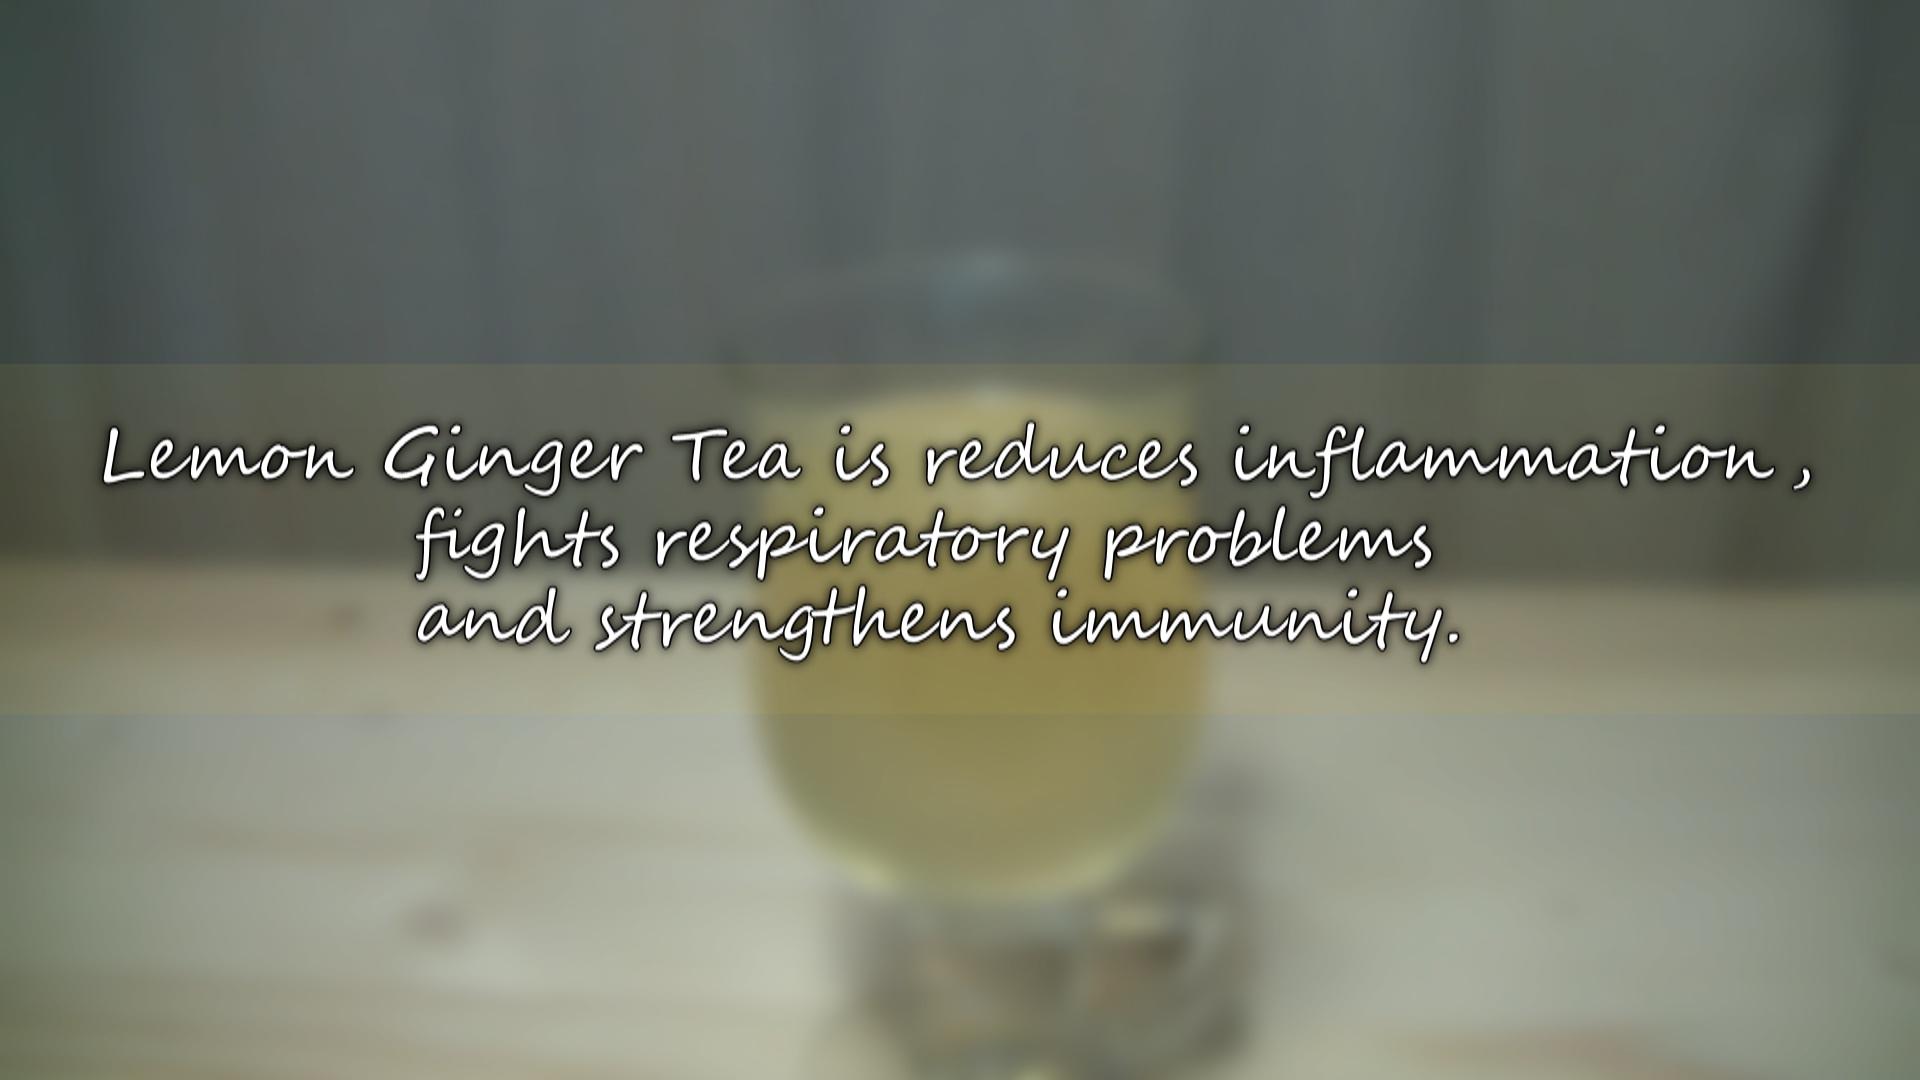 Picture of Anti-inflammatory Lemon Ginger Tea